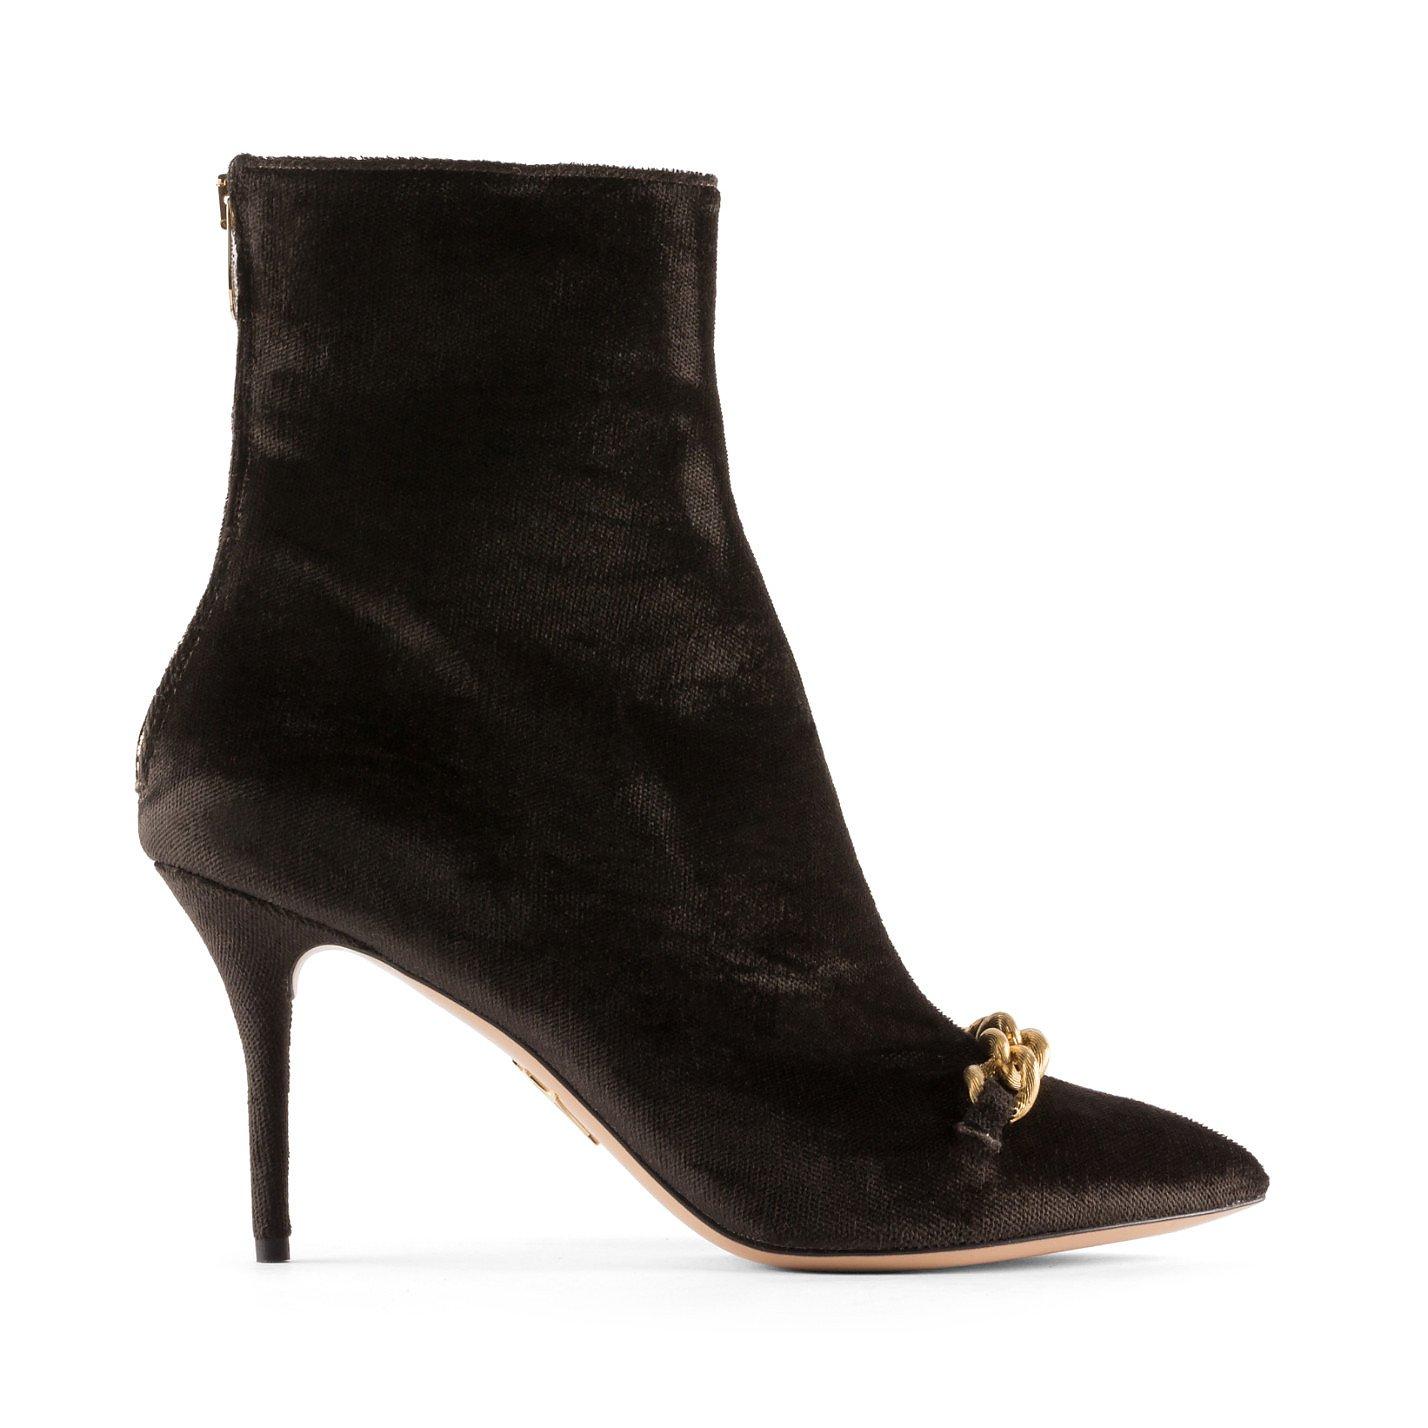 Charlotte Olympia Velvet Chain-Detail Ankle Boots